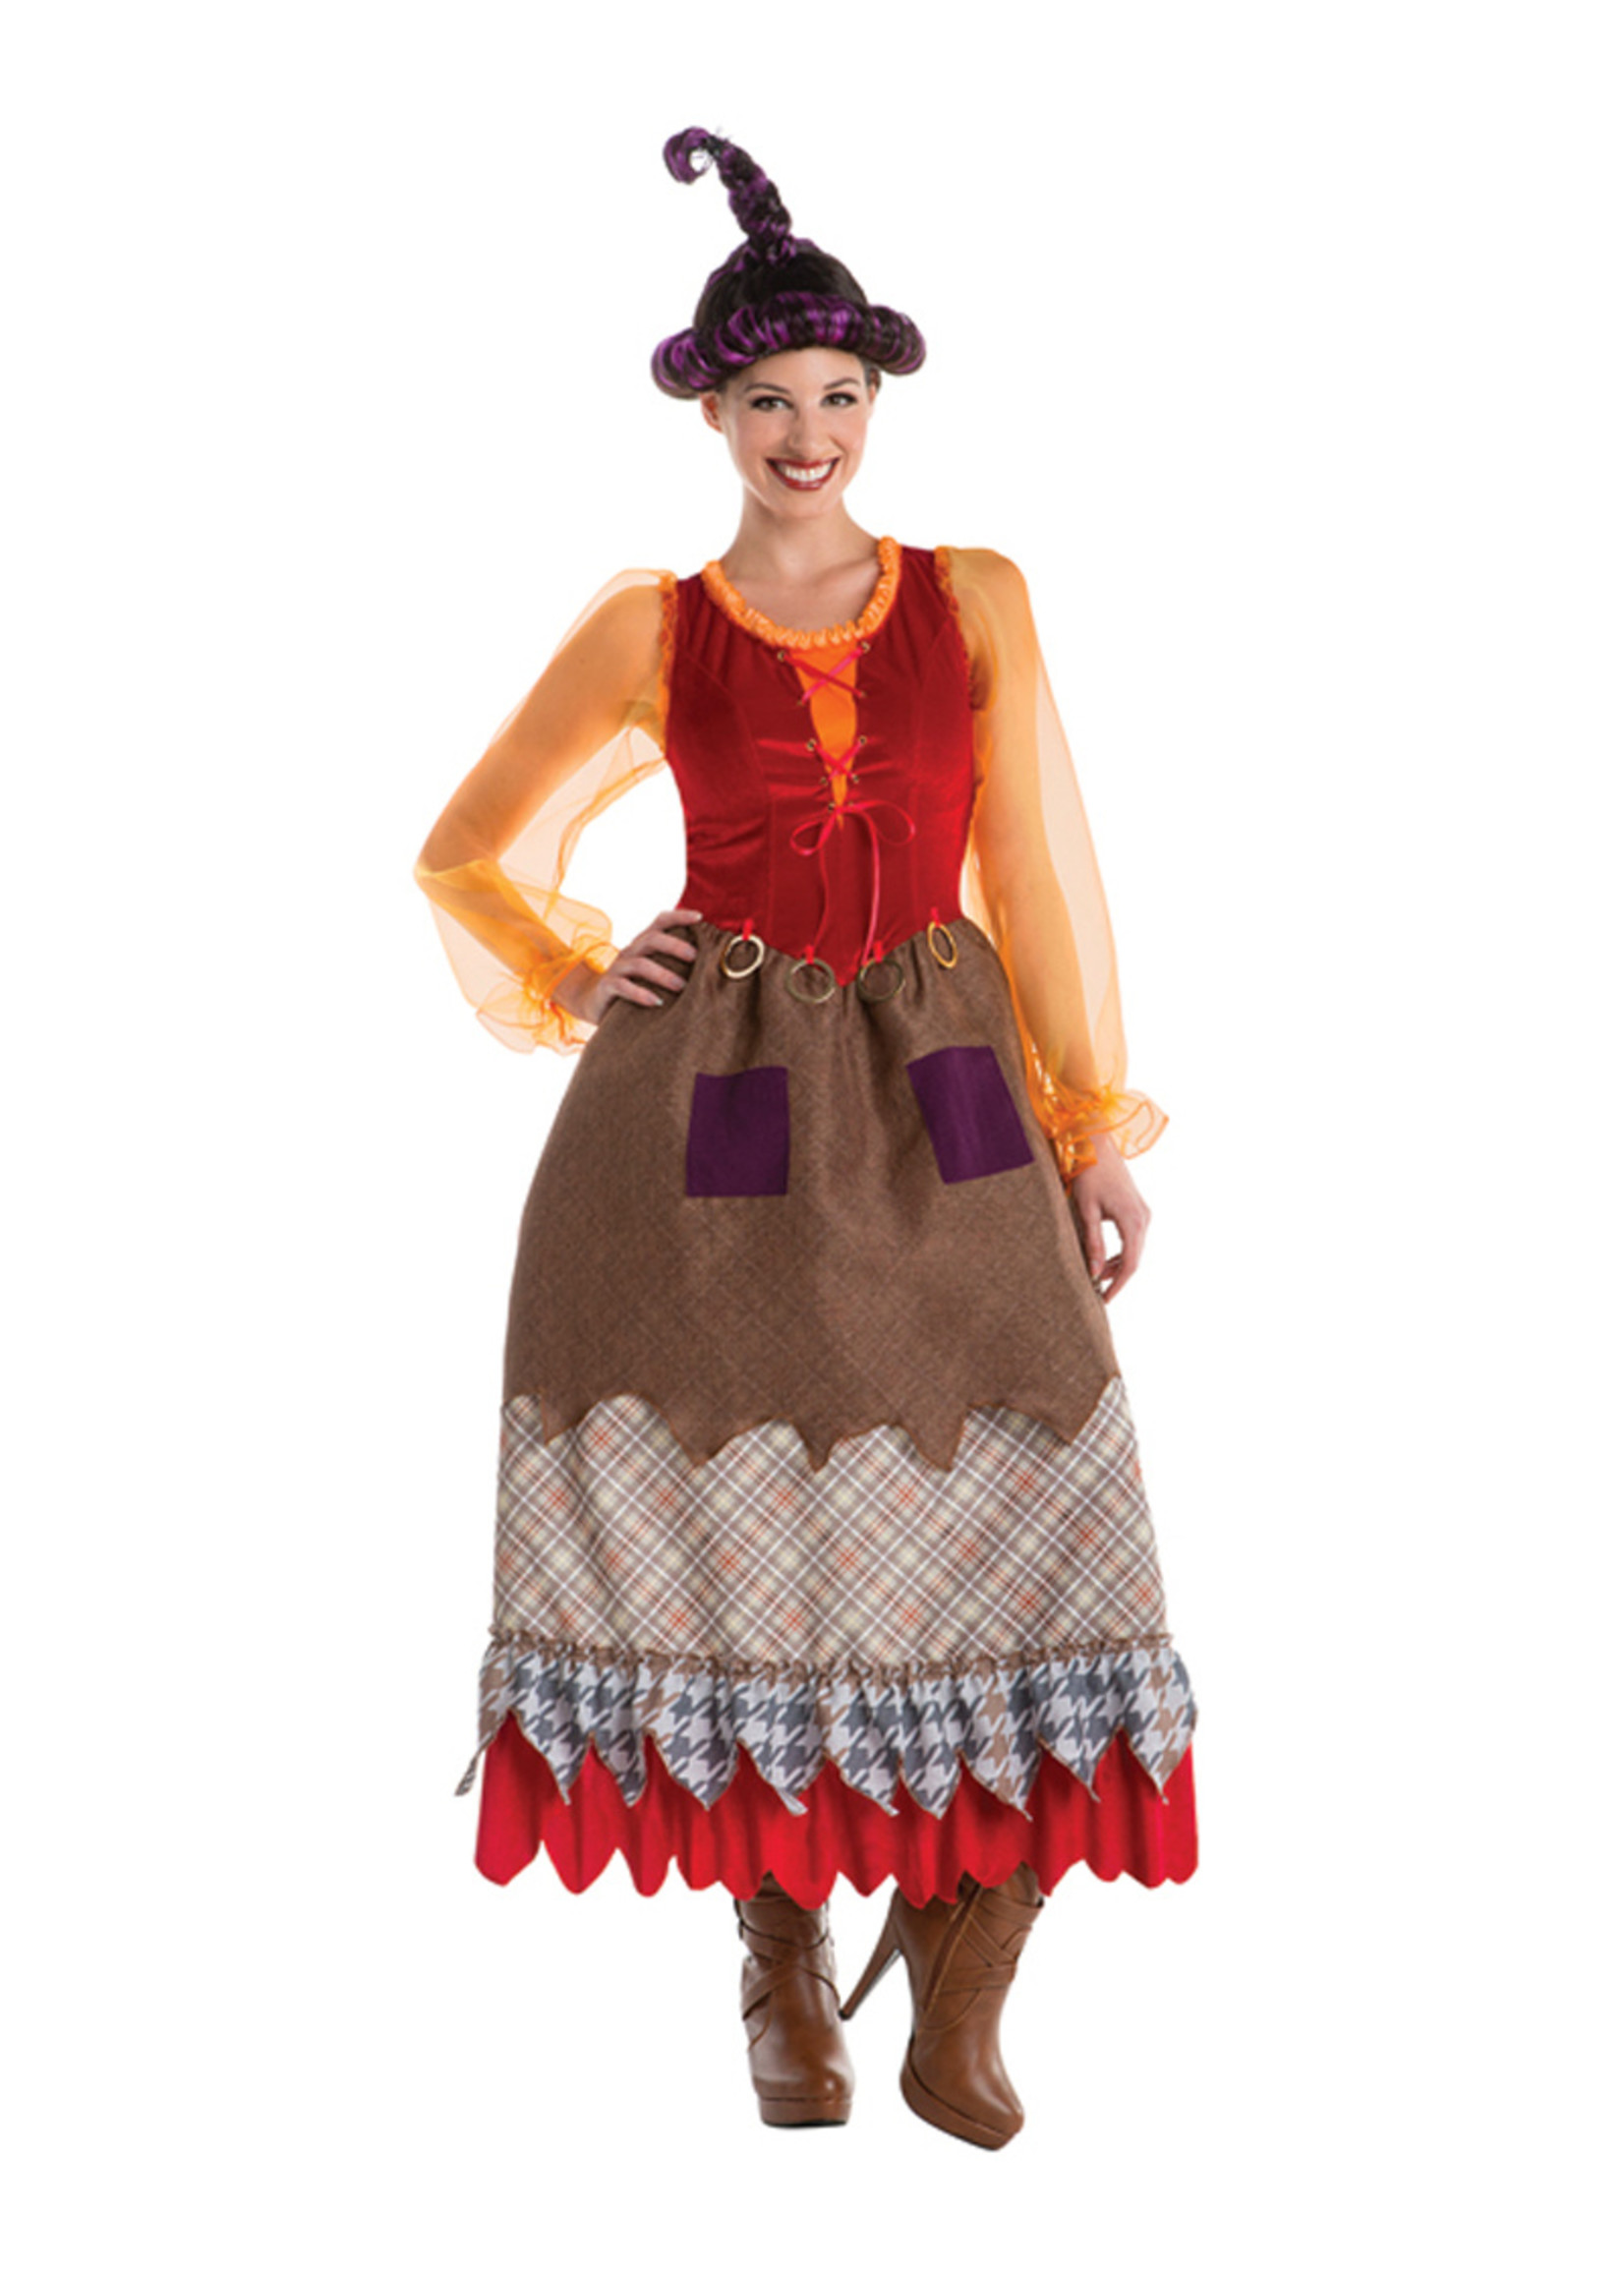 Goofy Salem Sister Costume - Women's